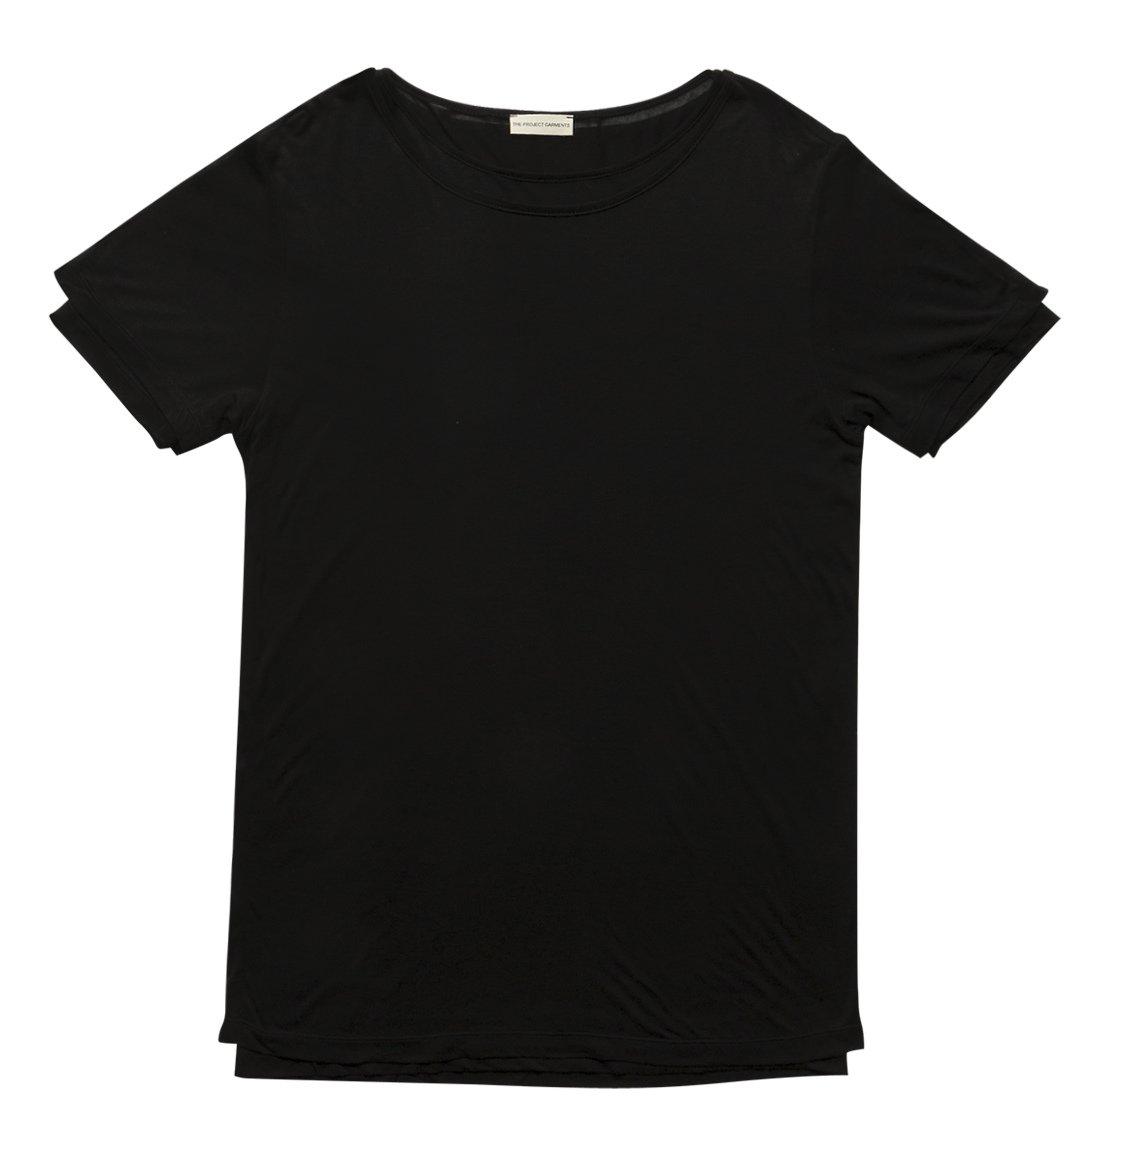 The Project Garments Silk Blend Double Crew Neck T-Shirt Black